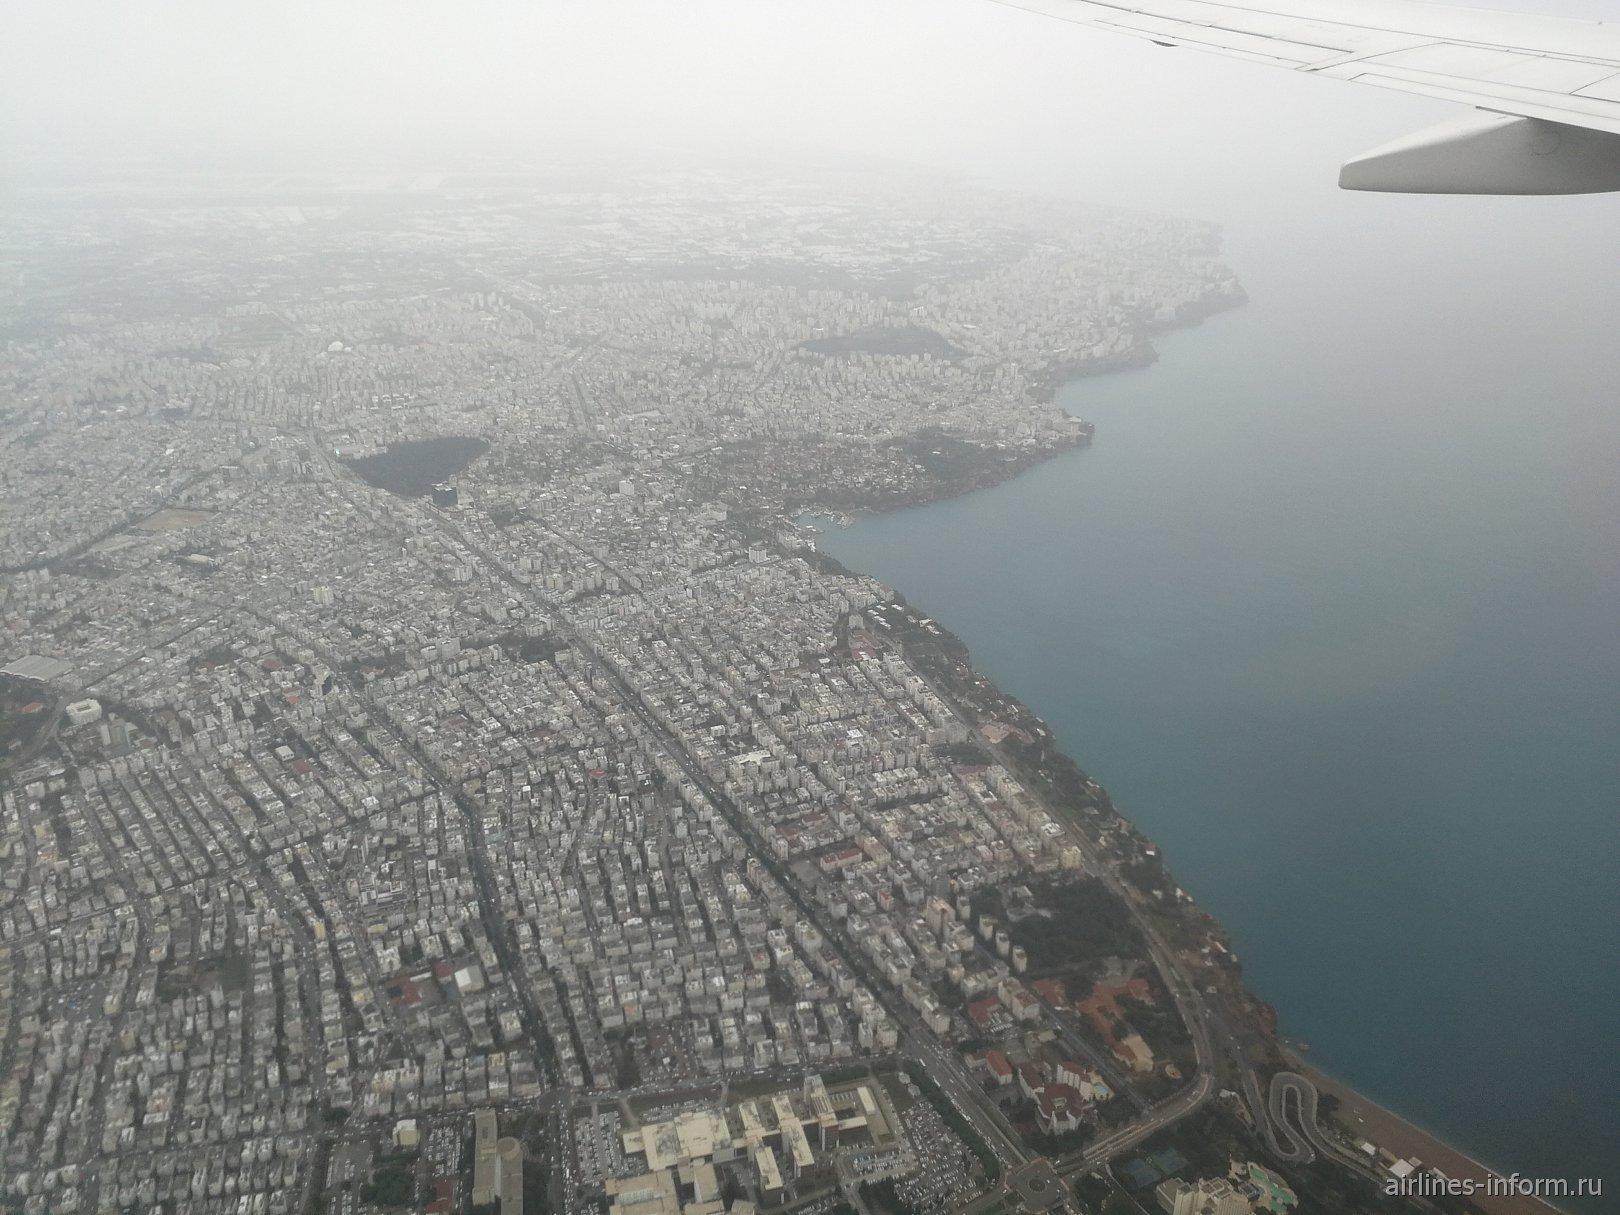 Вид на город Анталья перед посадкой в аэропорту